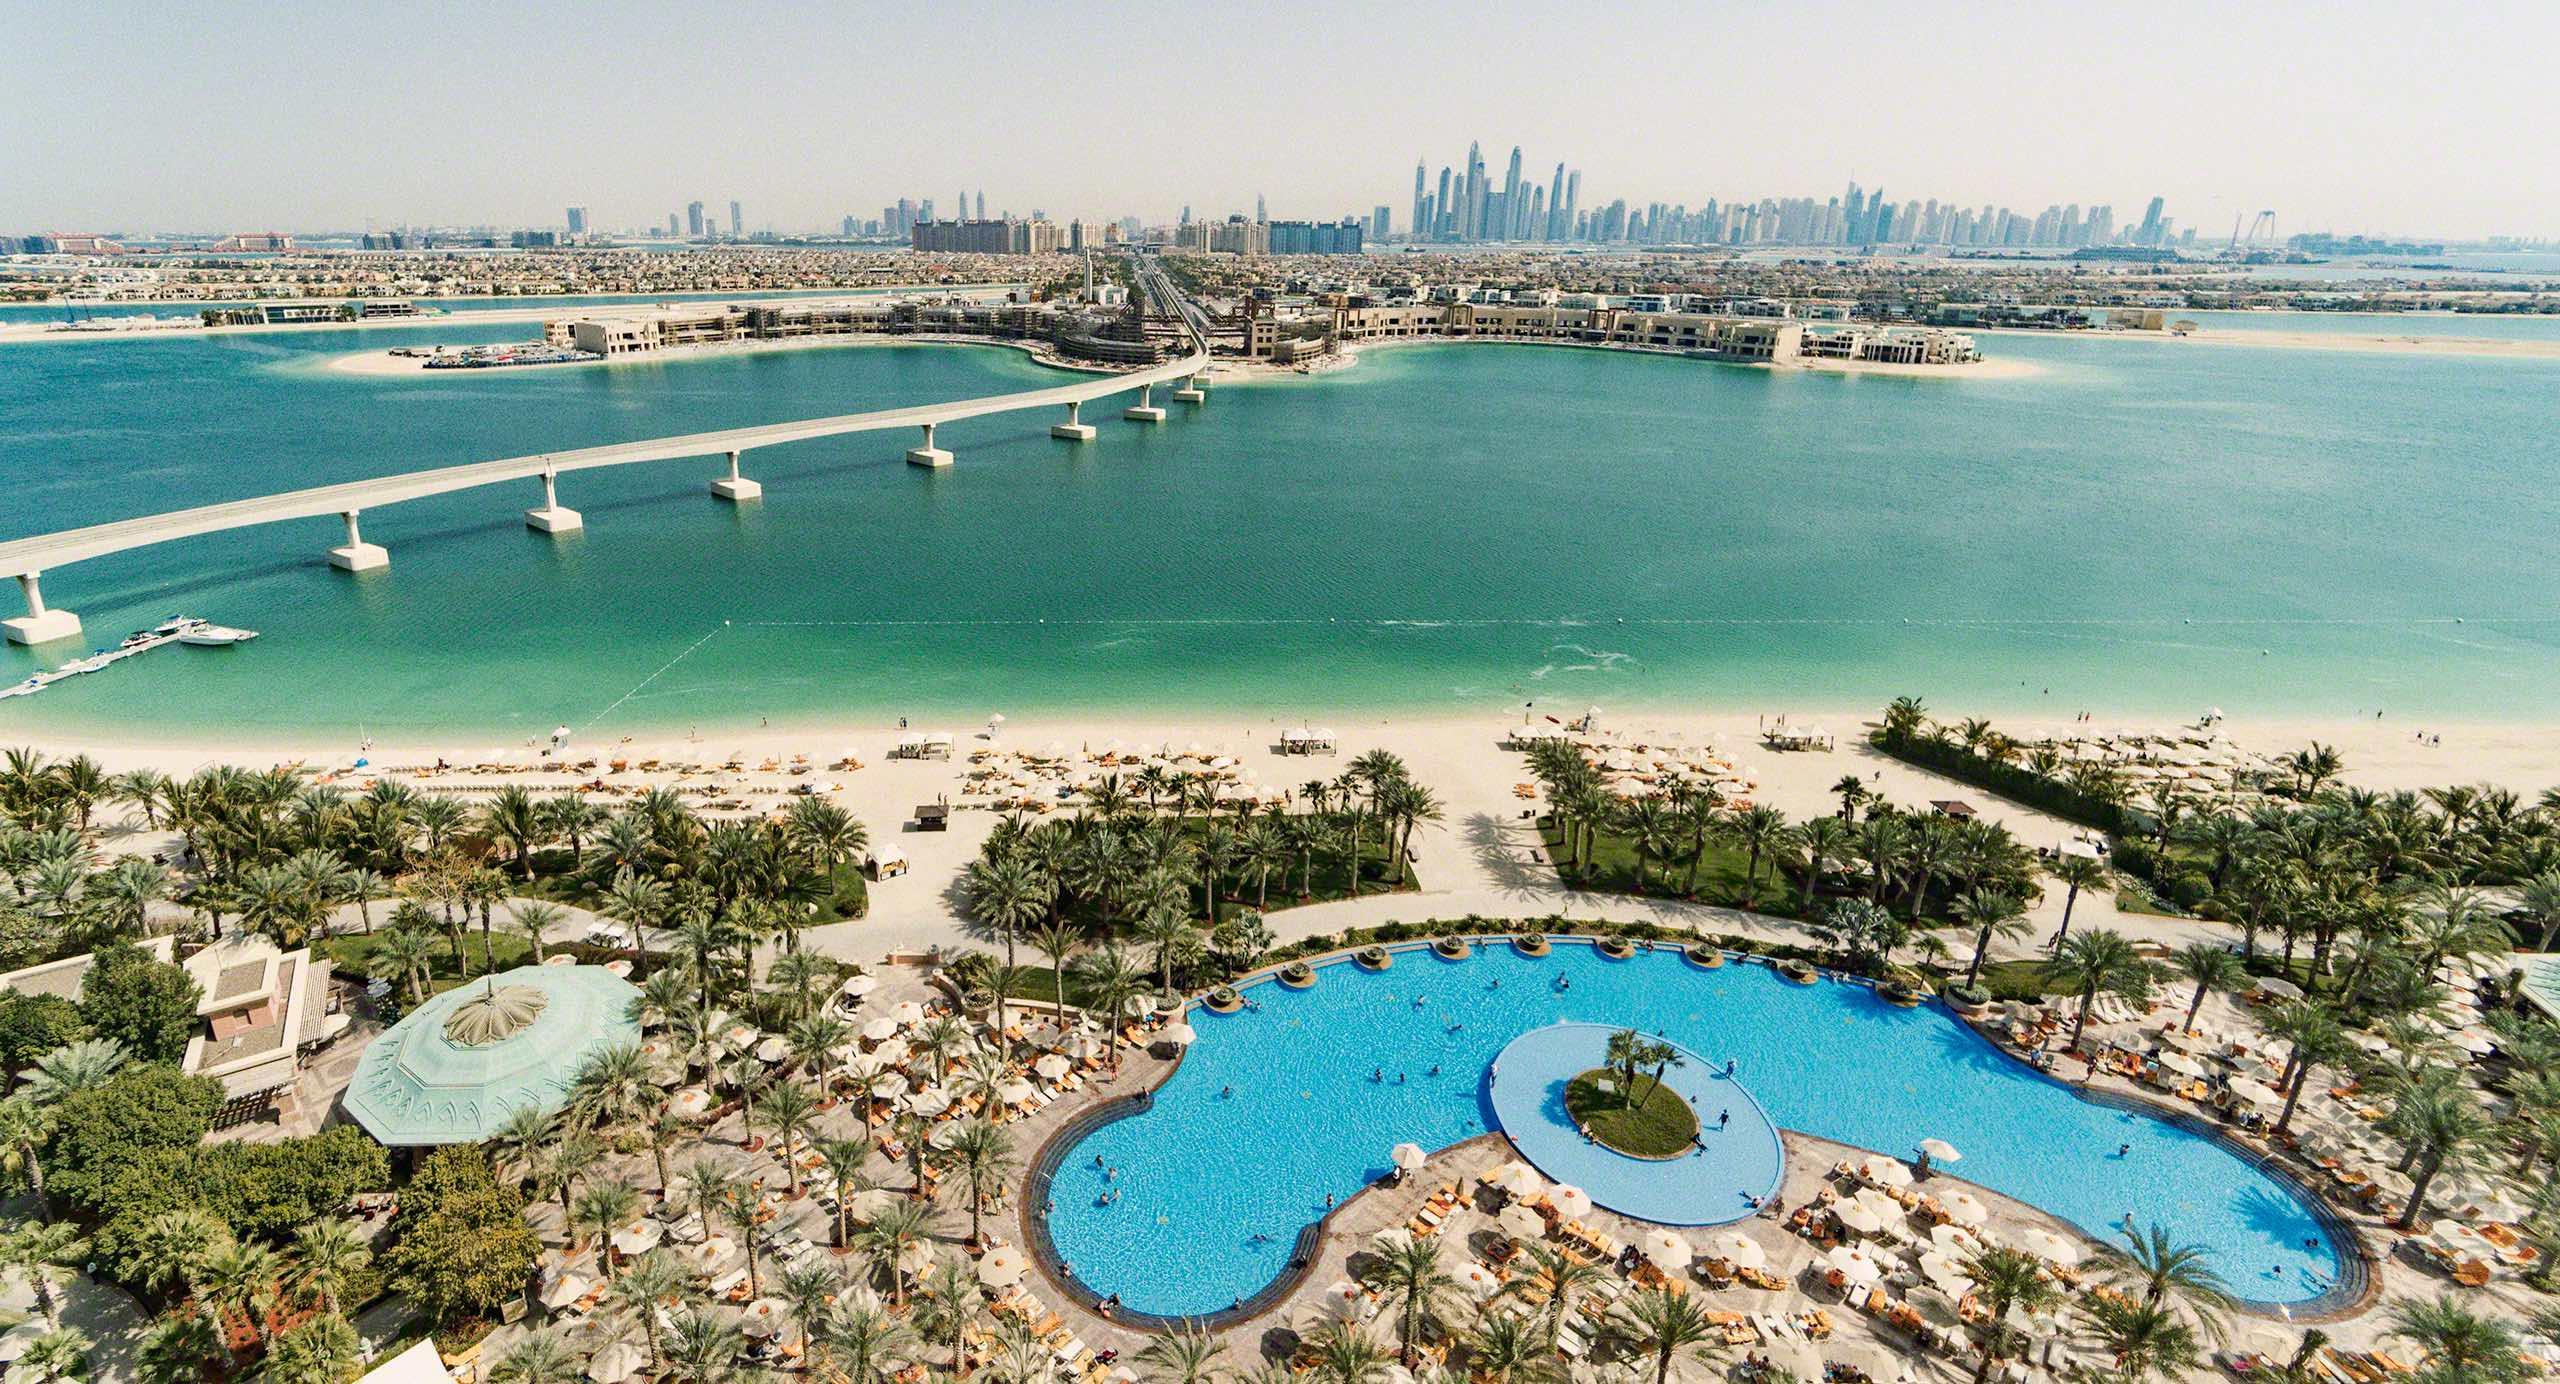 Atlantis The Palm: Strandblick und die Dubai Skyline. Foto © Mirco Seyfert